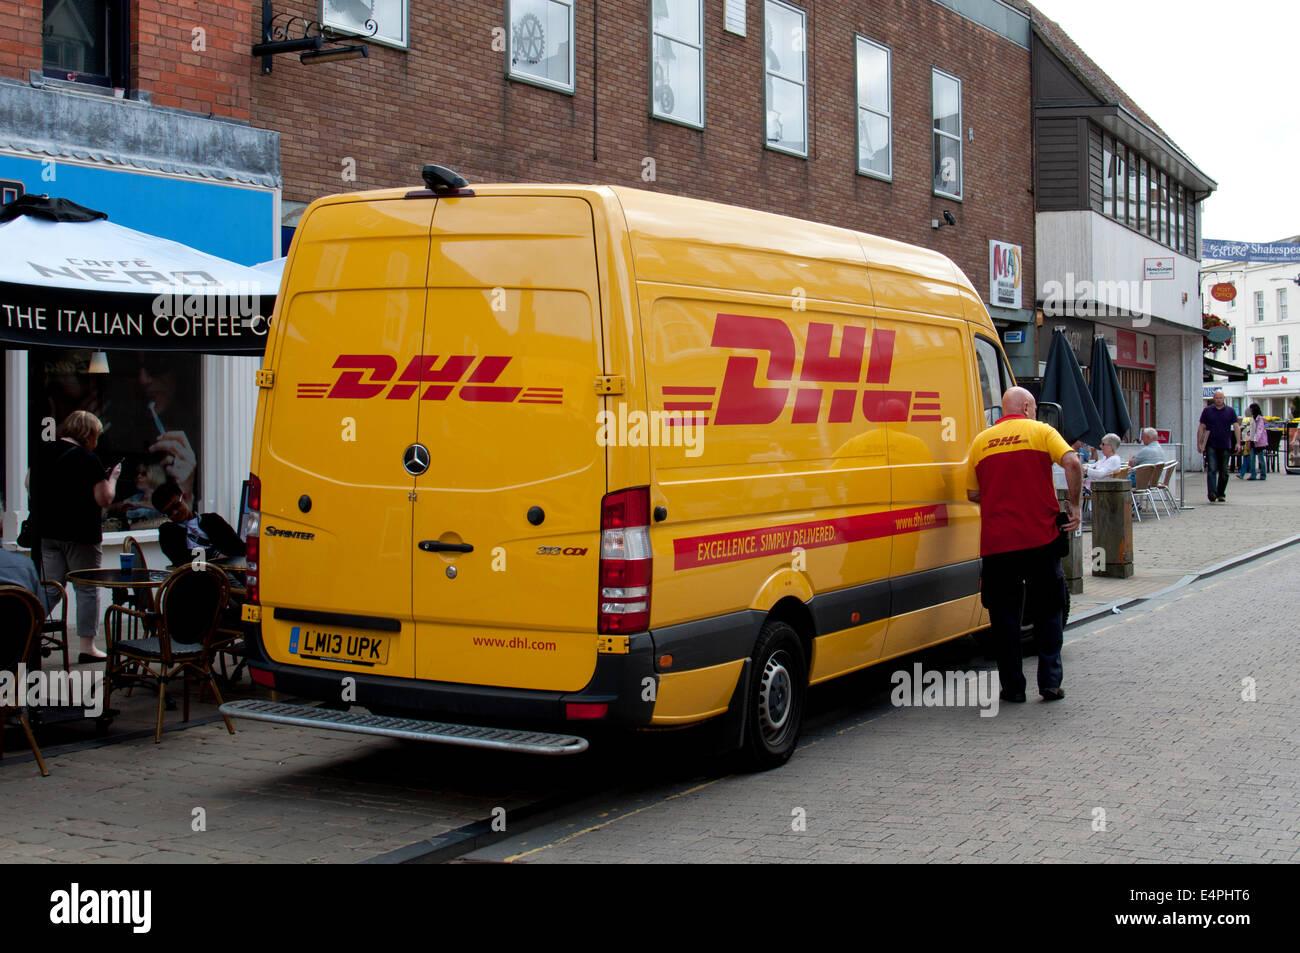 dhl van and driver stratford upon avon uk stock photo 71797046 alamy. Black Bedroom Furniture Sets. Home Design Ideas